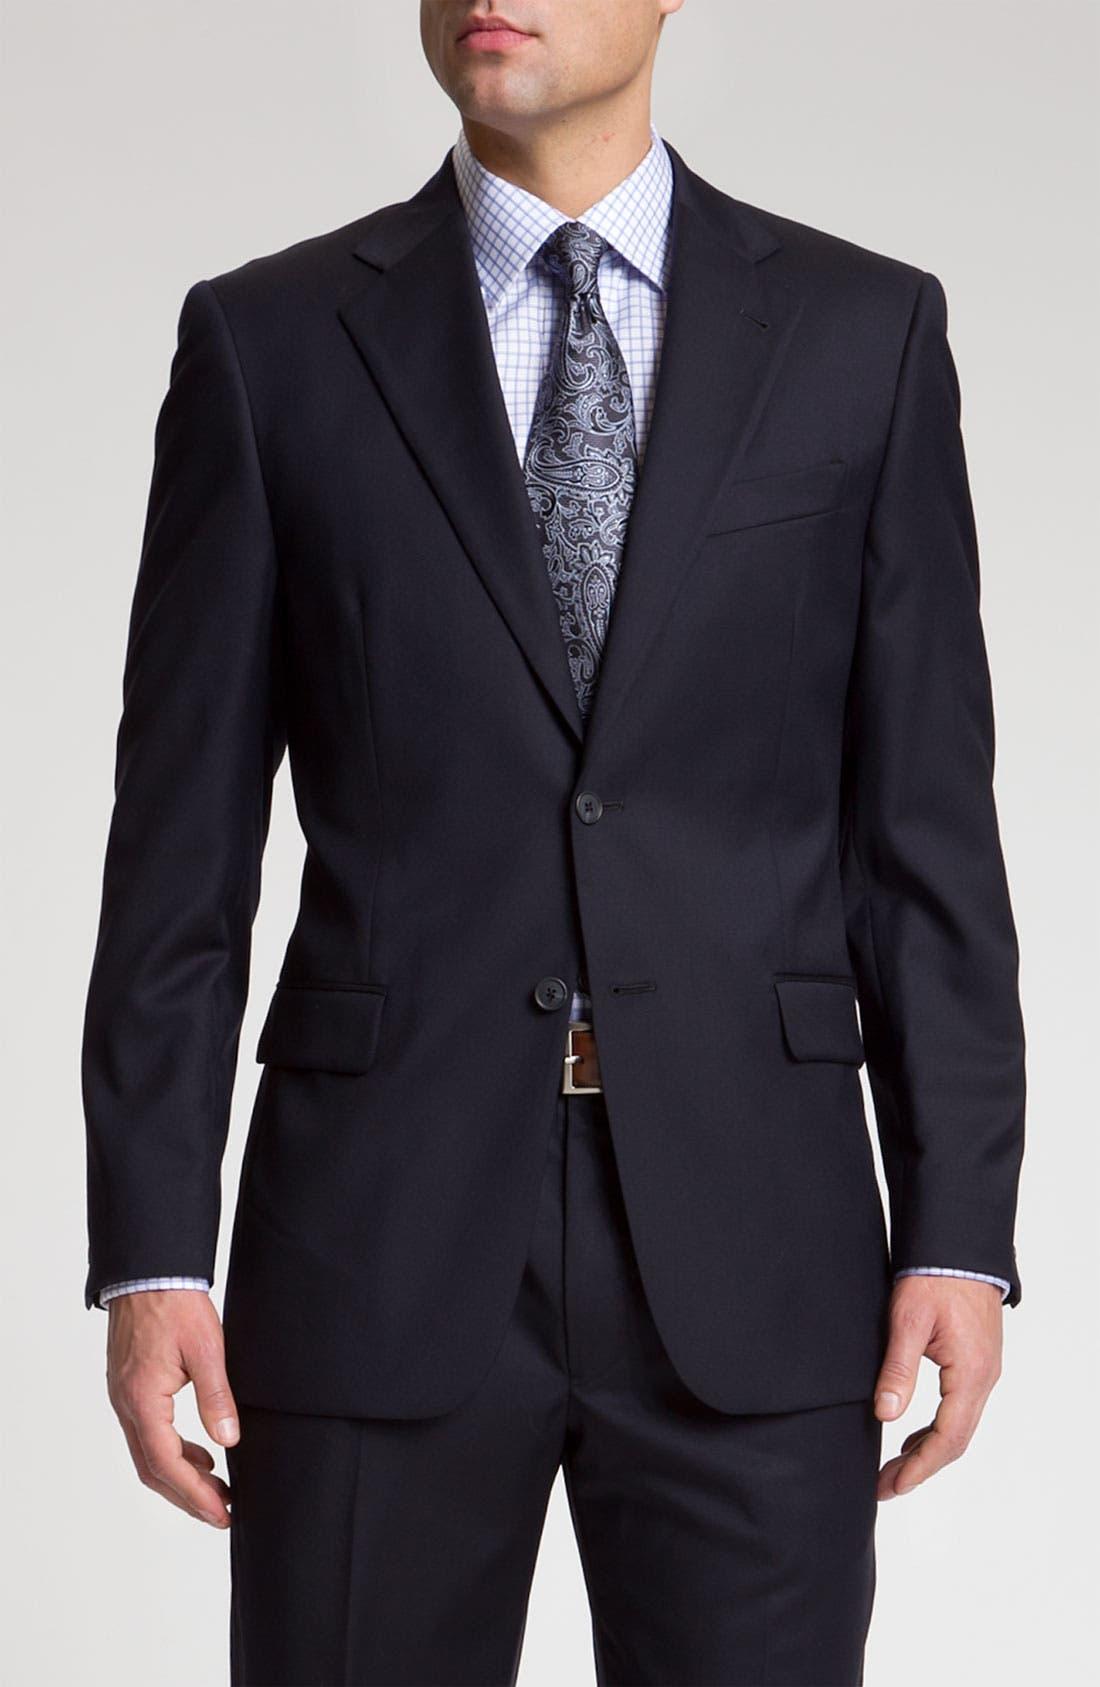 Main Image - Joseph Abboud 'Signature Silver' Navy Wool Suit